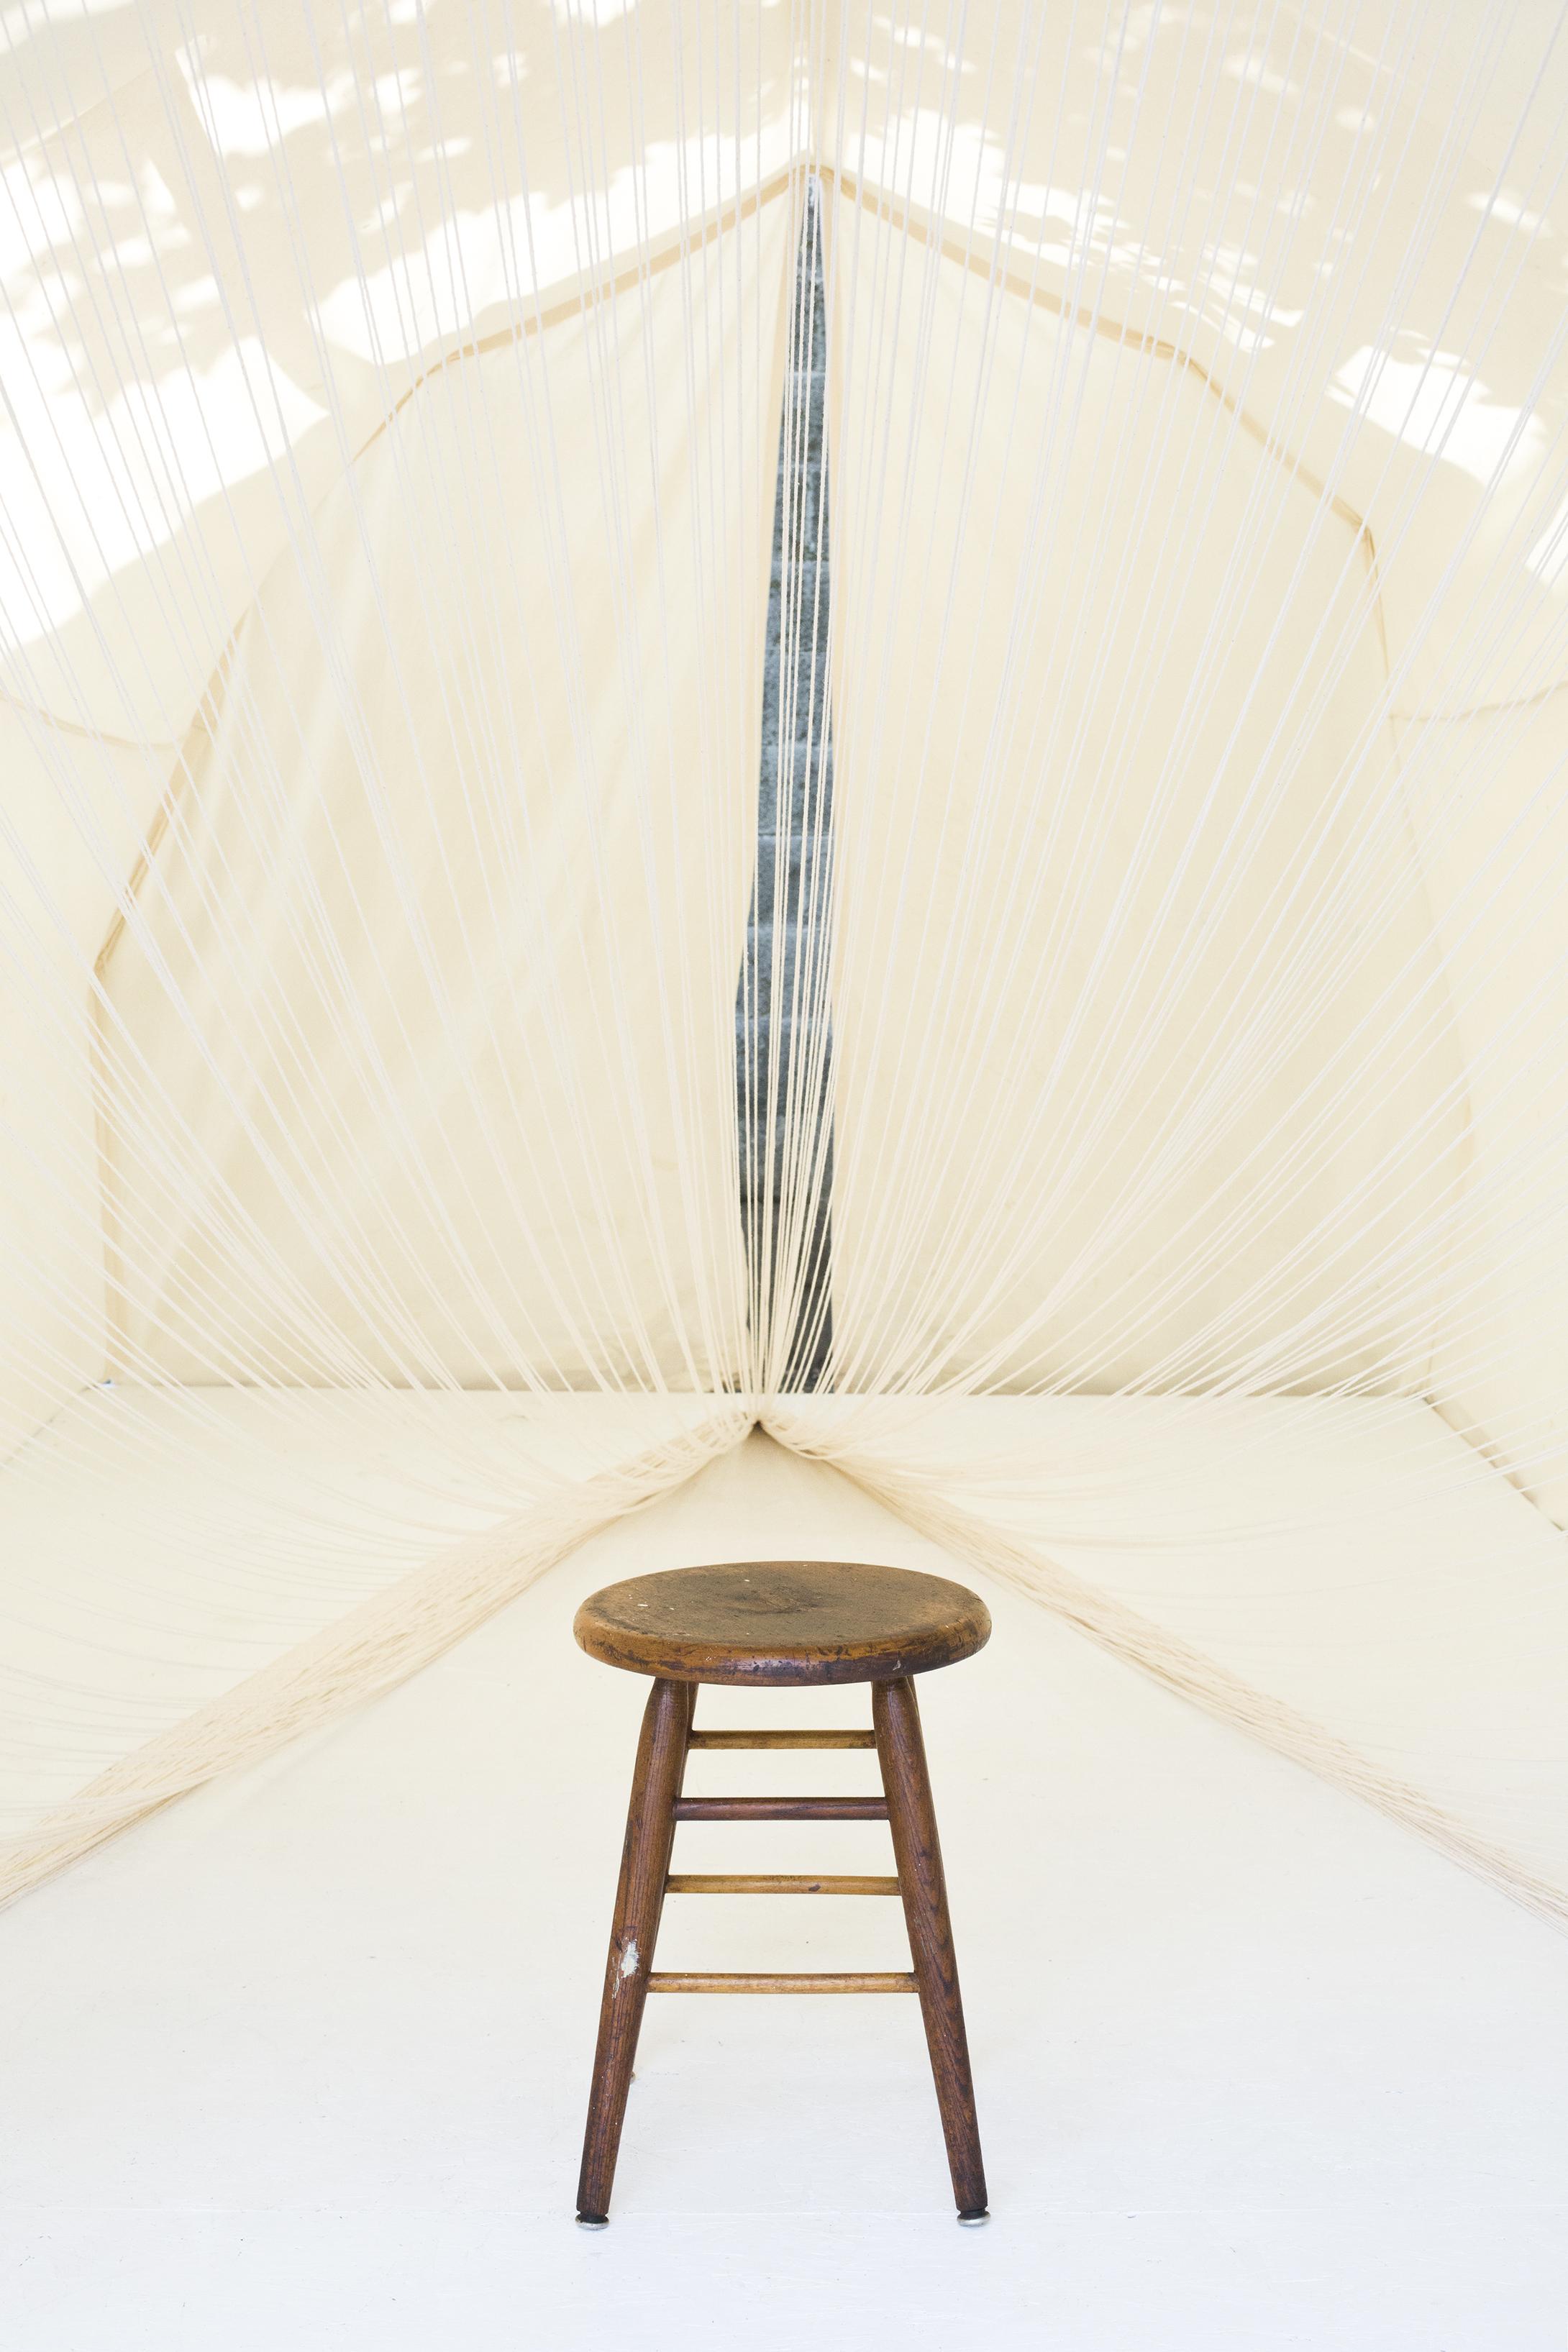 Untitled Space (photo by Julia Barnes-Saltzman)